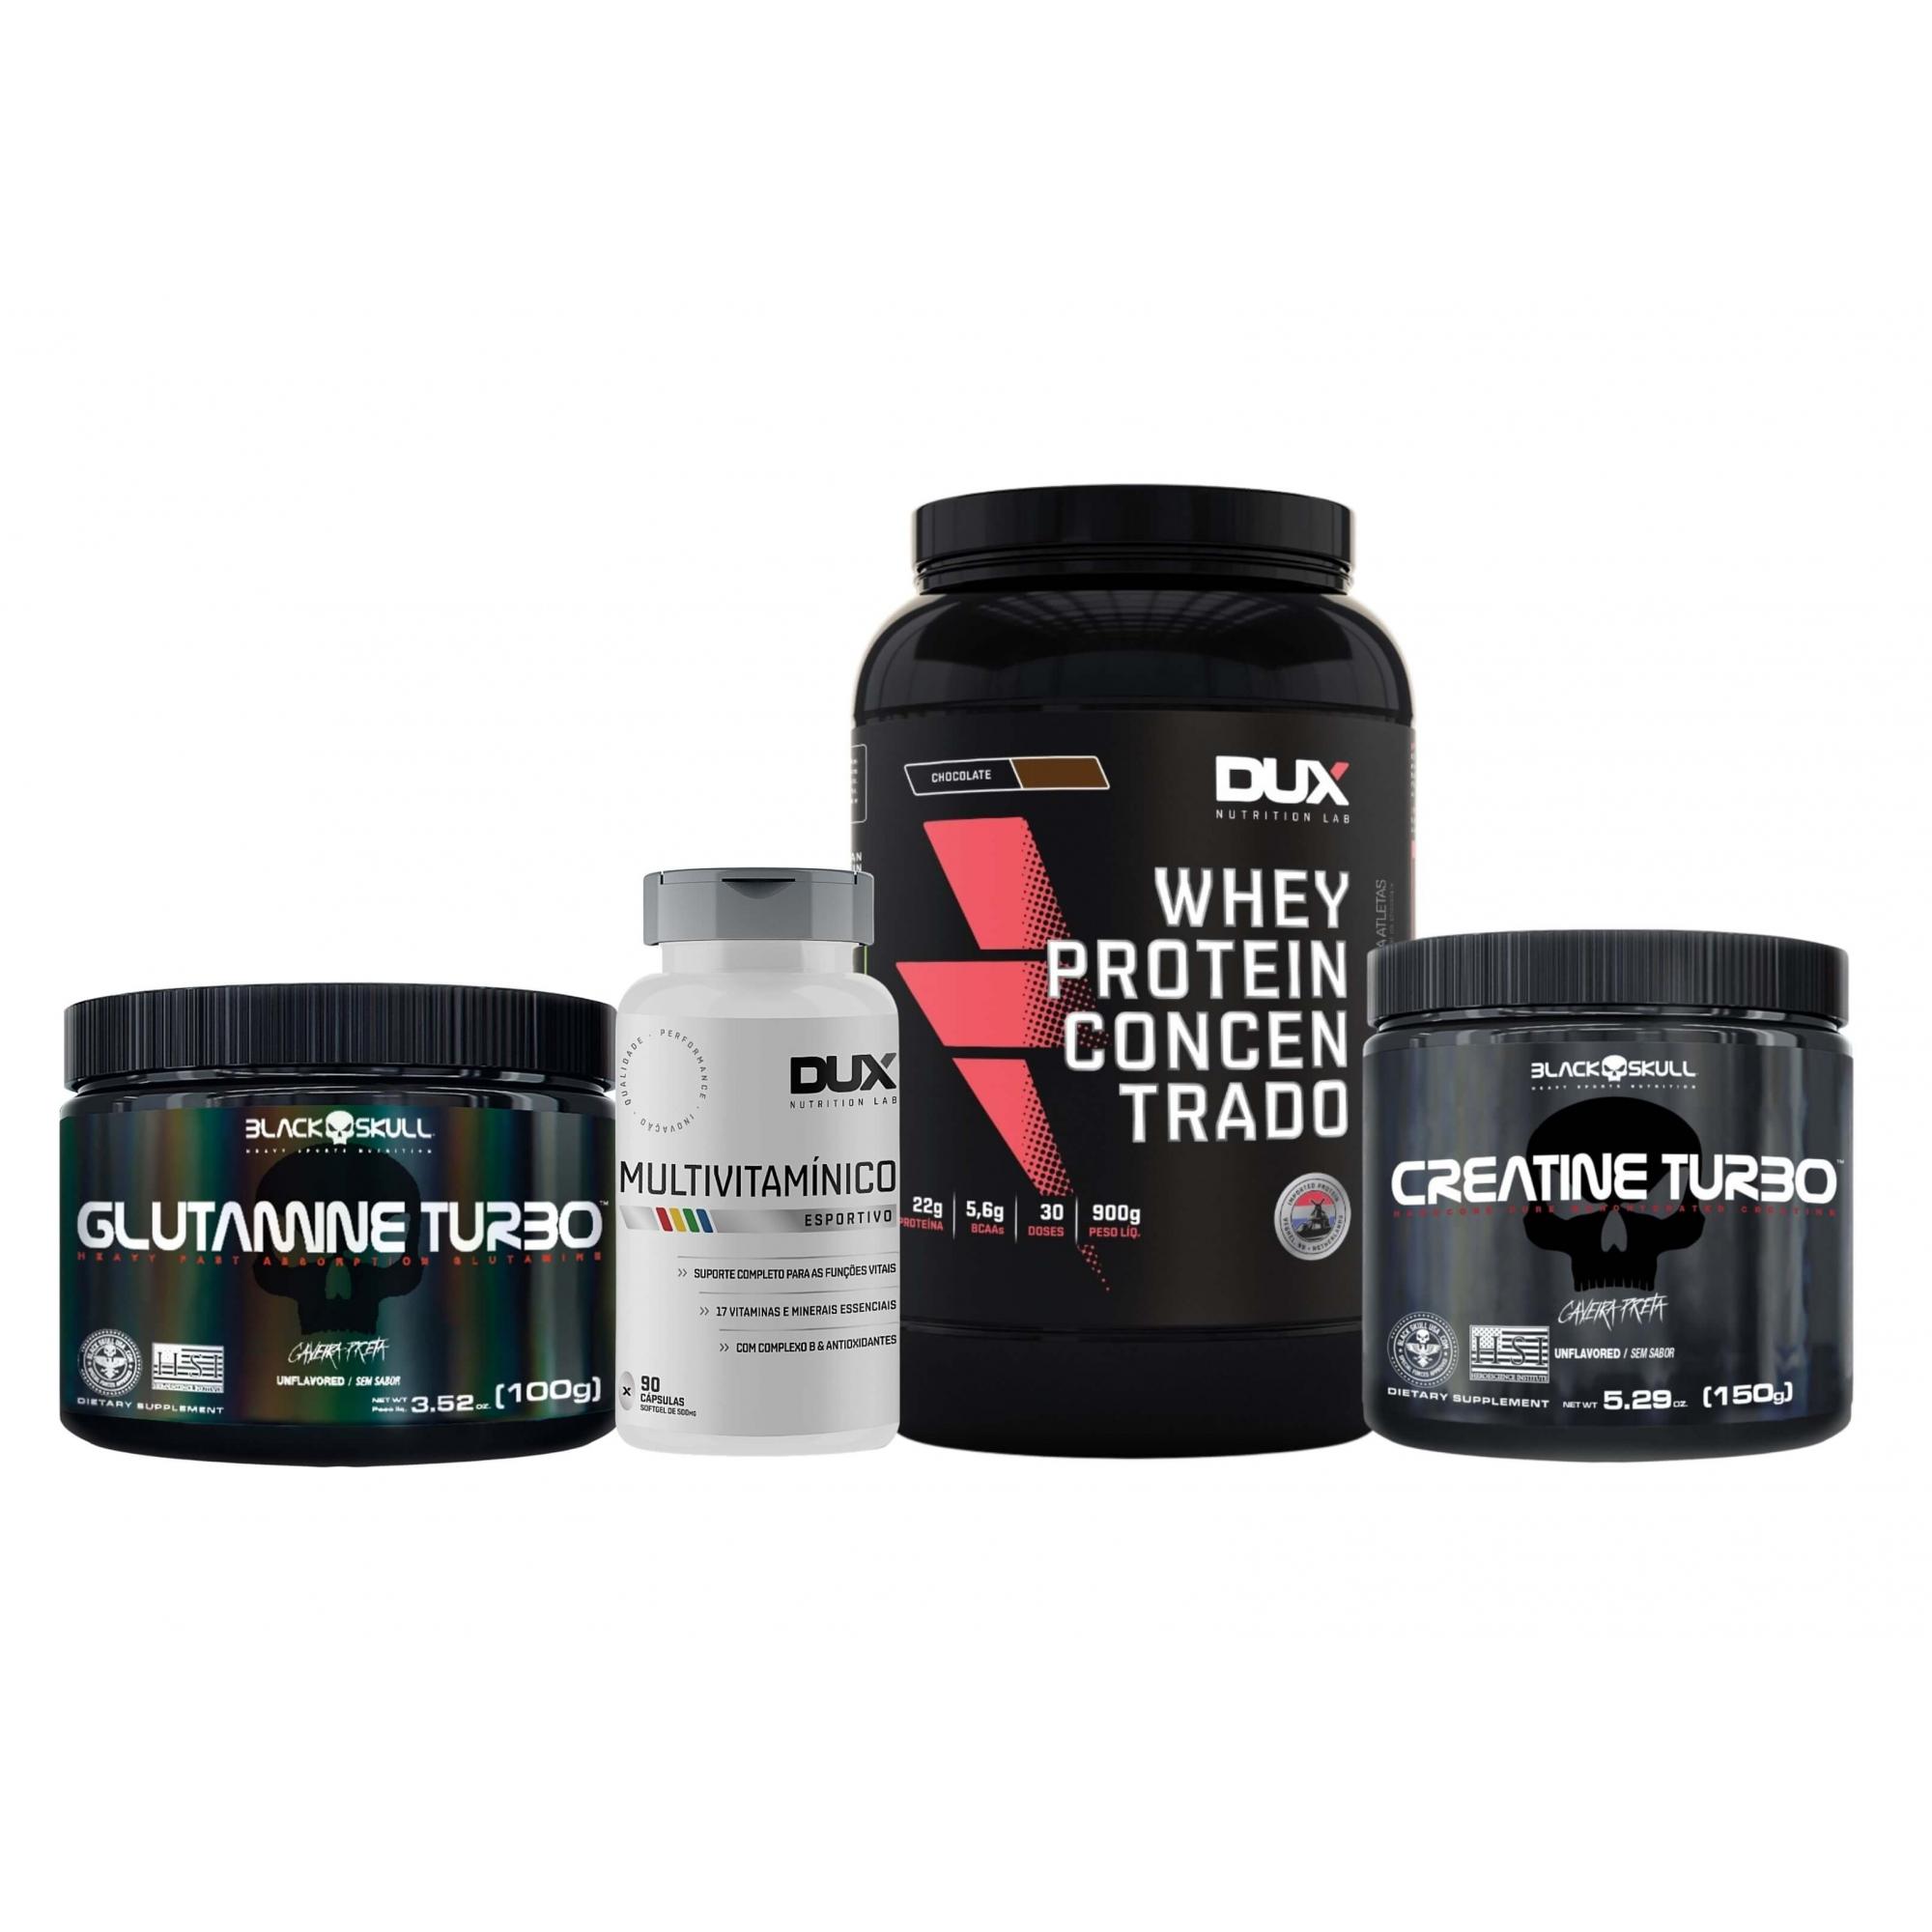 Whey Protein Concentrado 900g + Creatina 150g + Glutamina 100g + Multivitaminico 90 caps